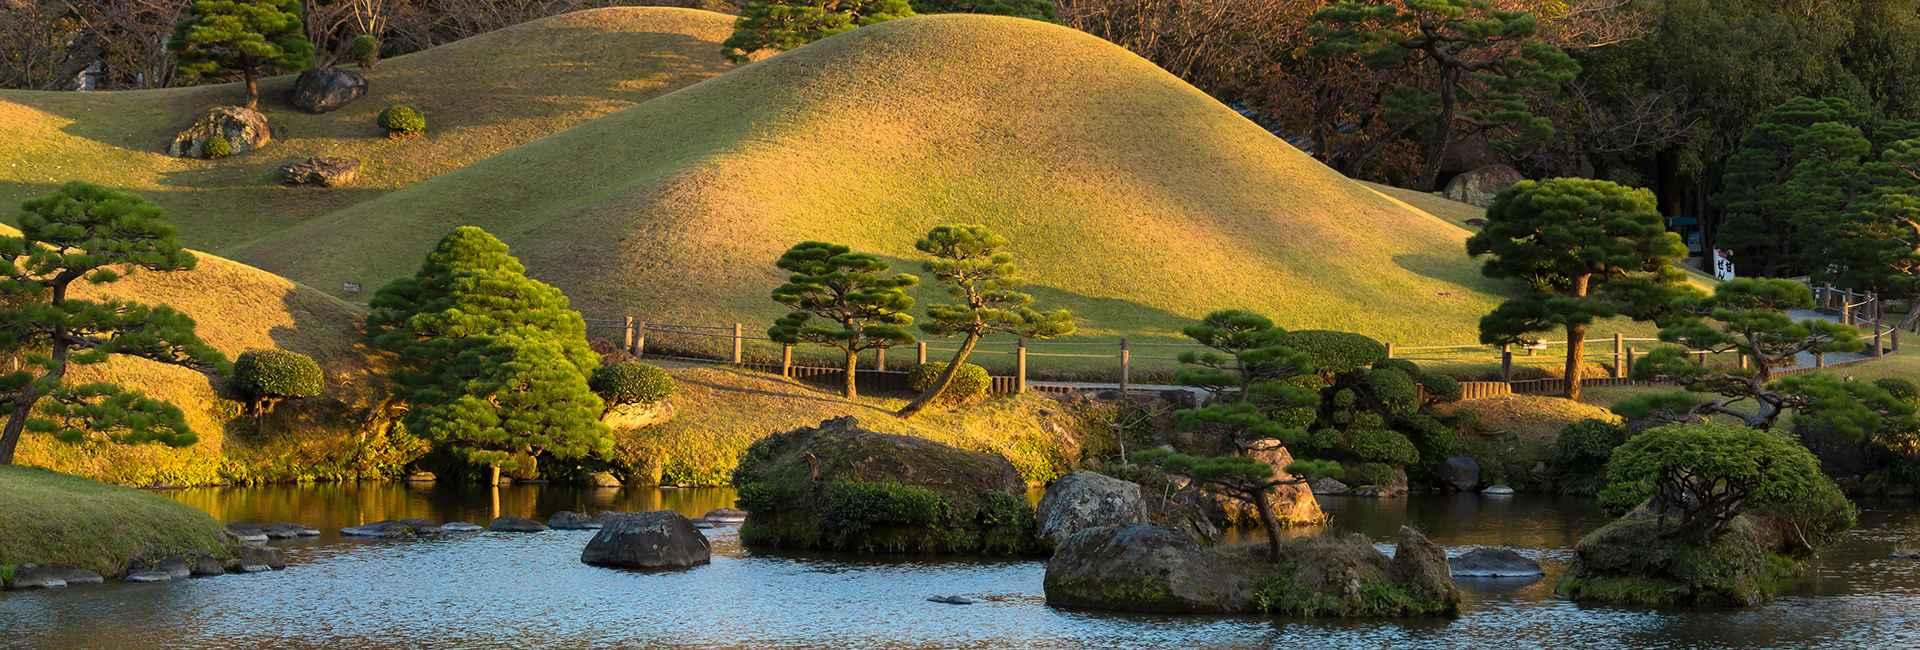 suizen garden in Kumamoto